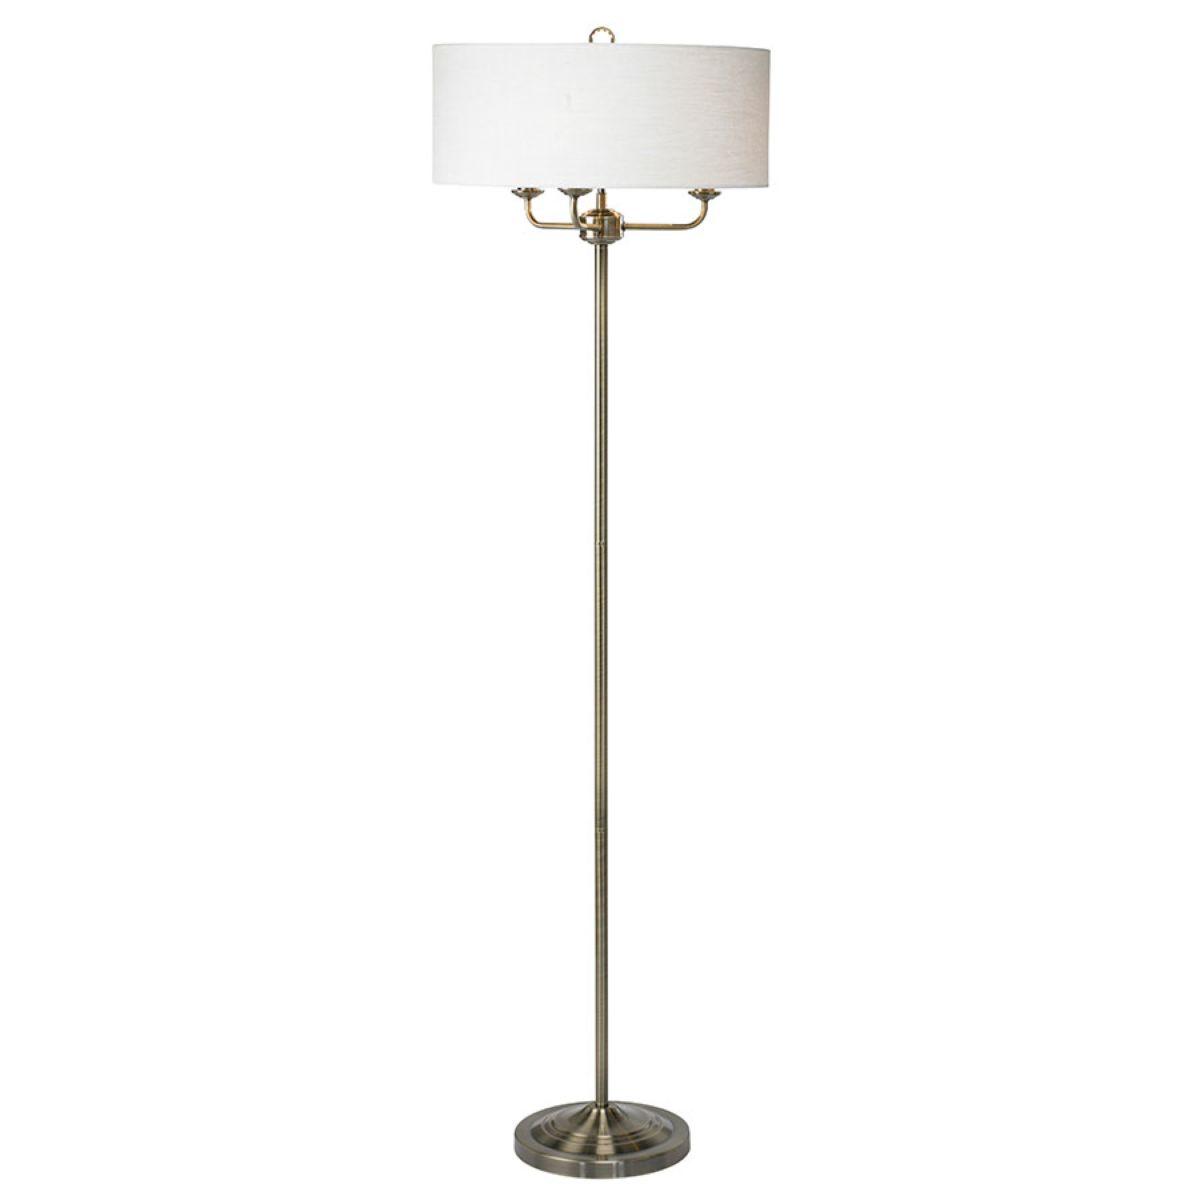 Village At Home Grantham Floor Lamp - Brass